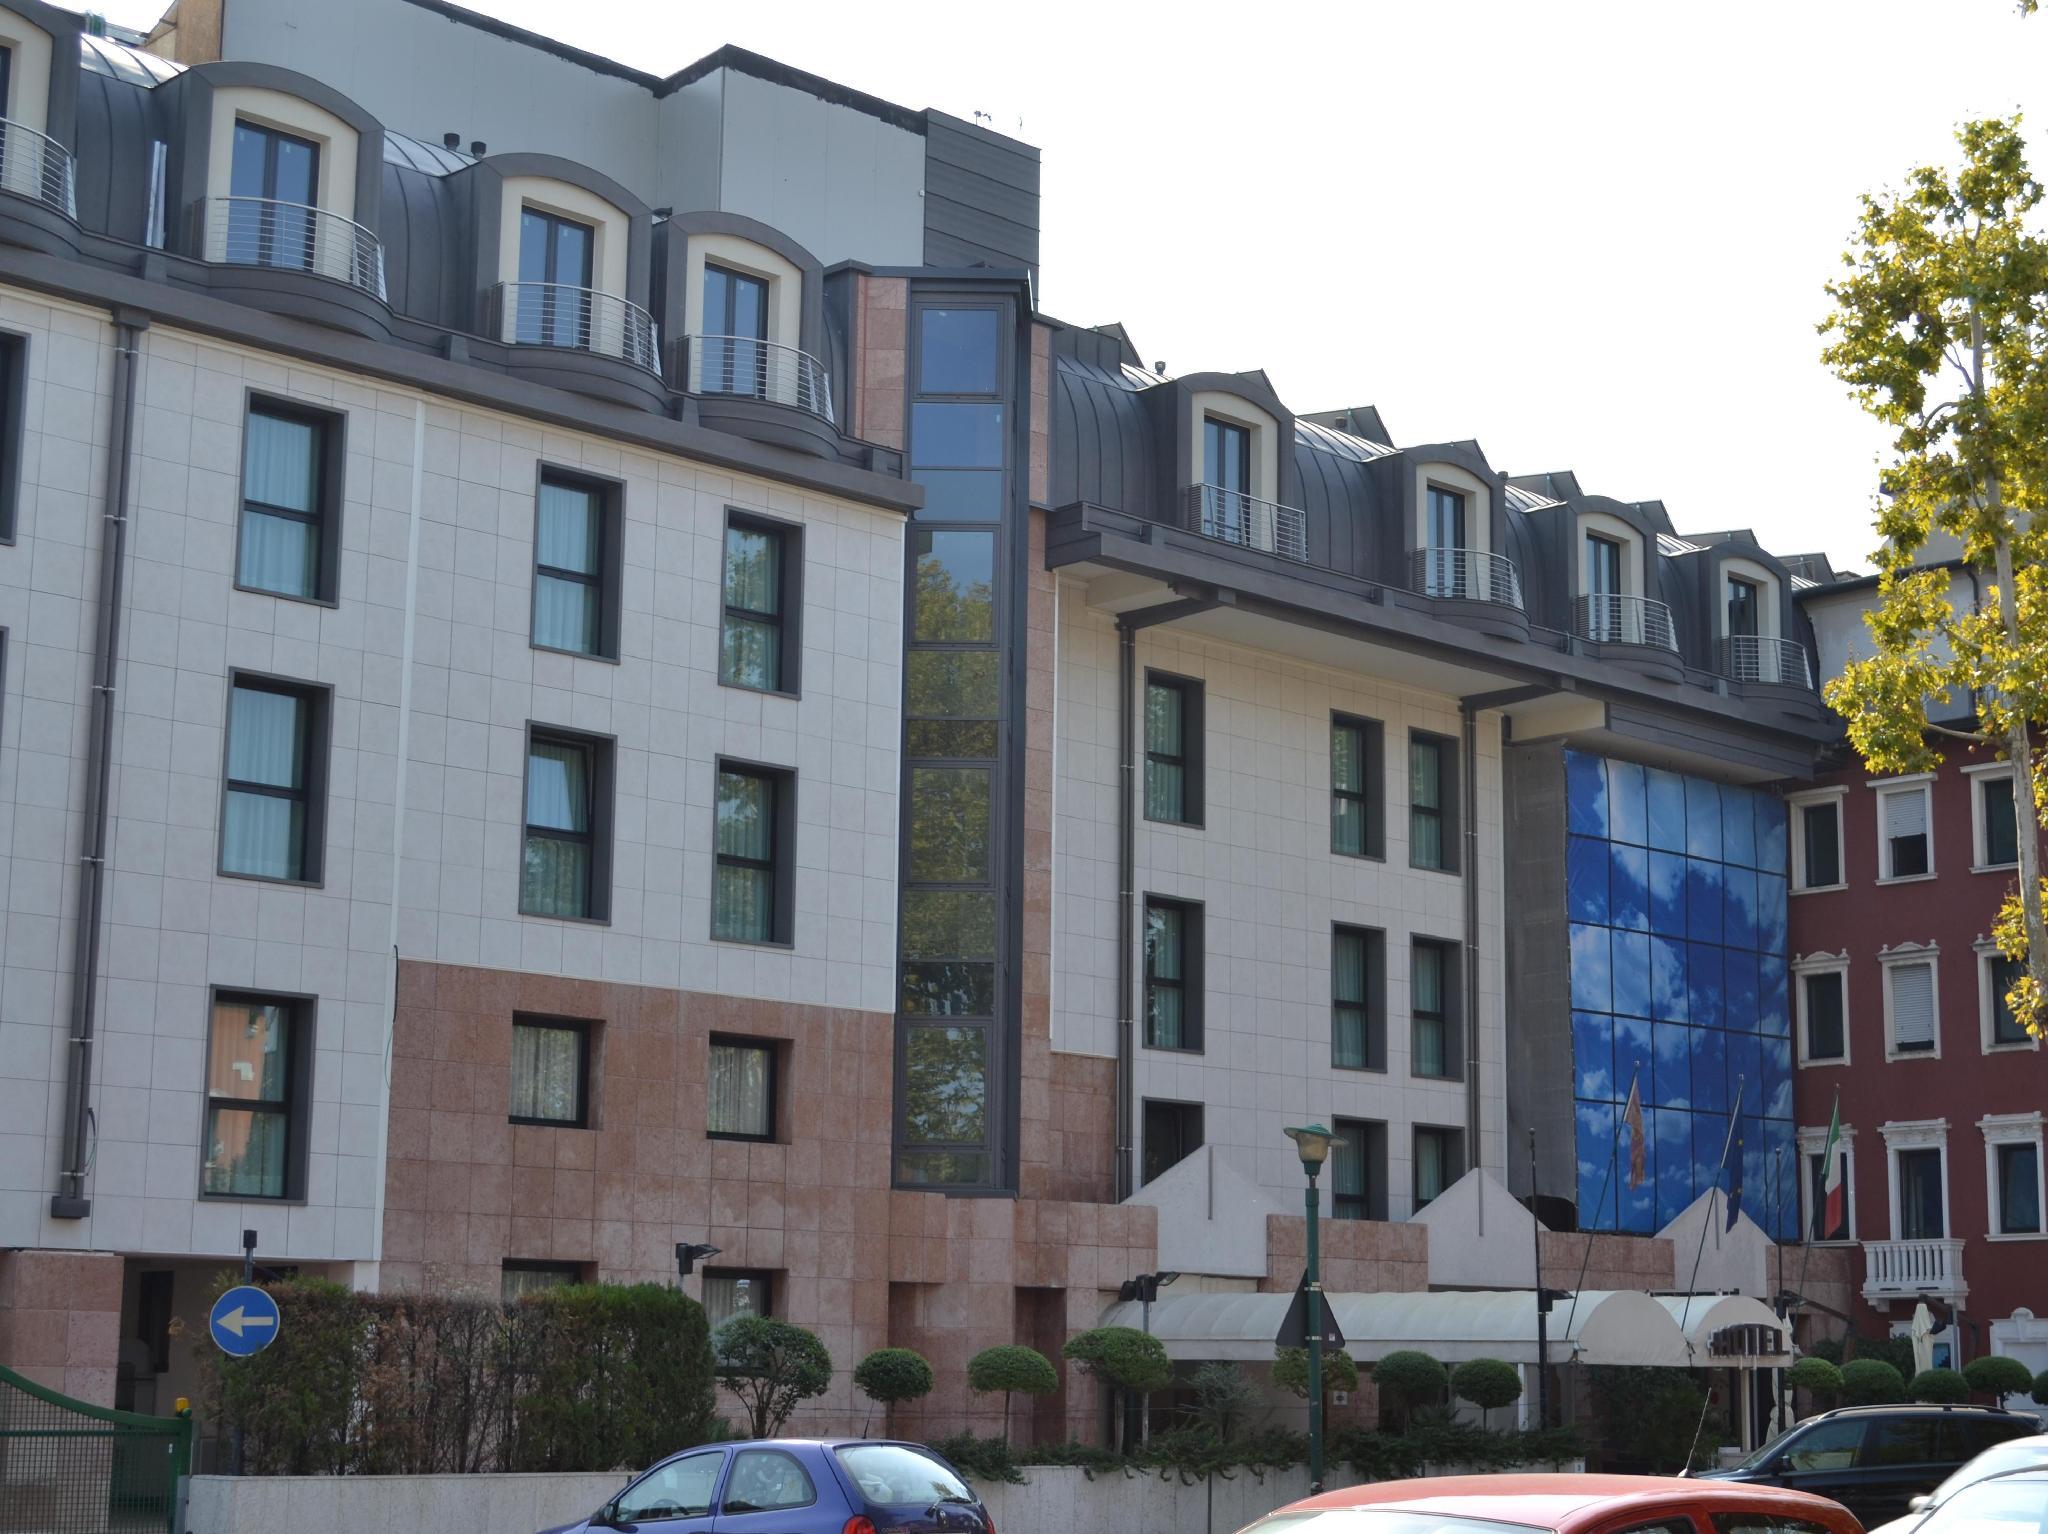 Tabaco Hotel Polen : Das hotel lugano torretta in venedig buchen